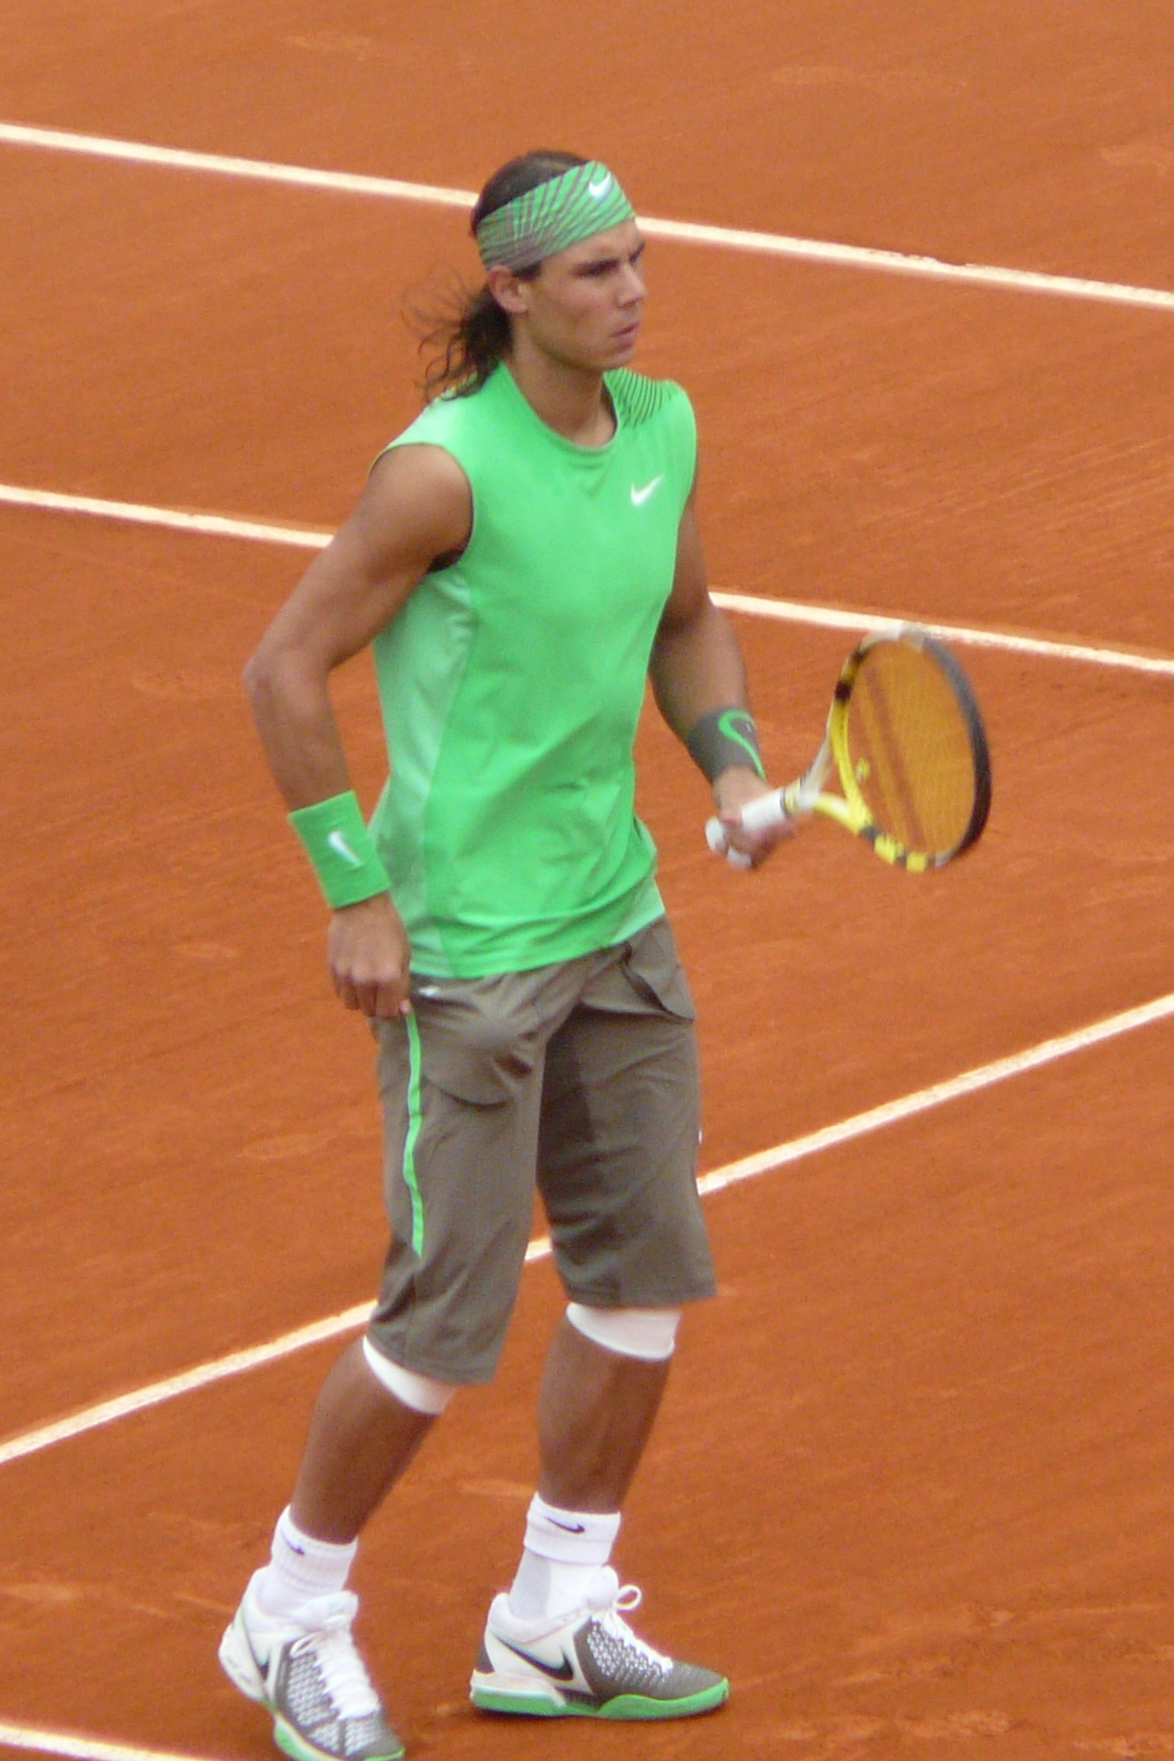 Nike Nadal Tennis Shoes